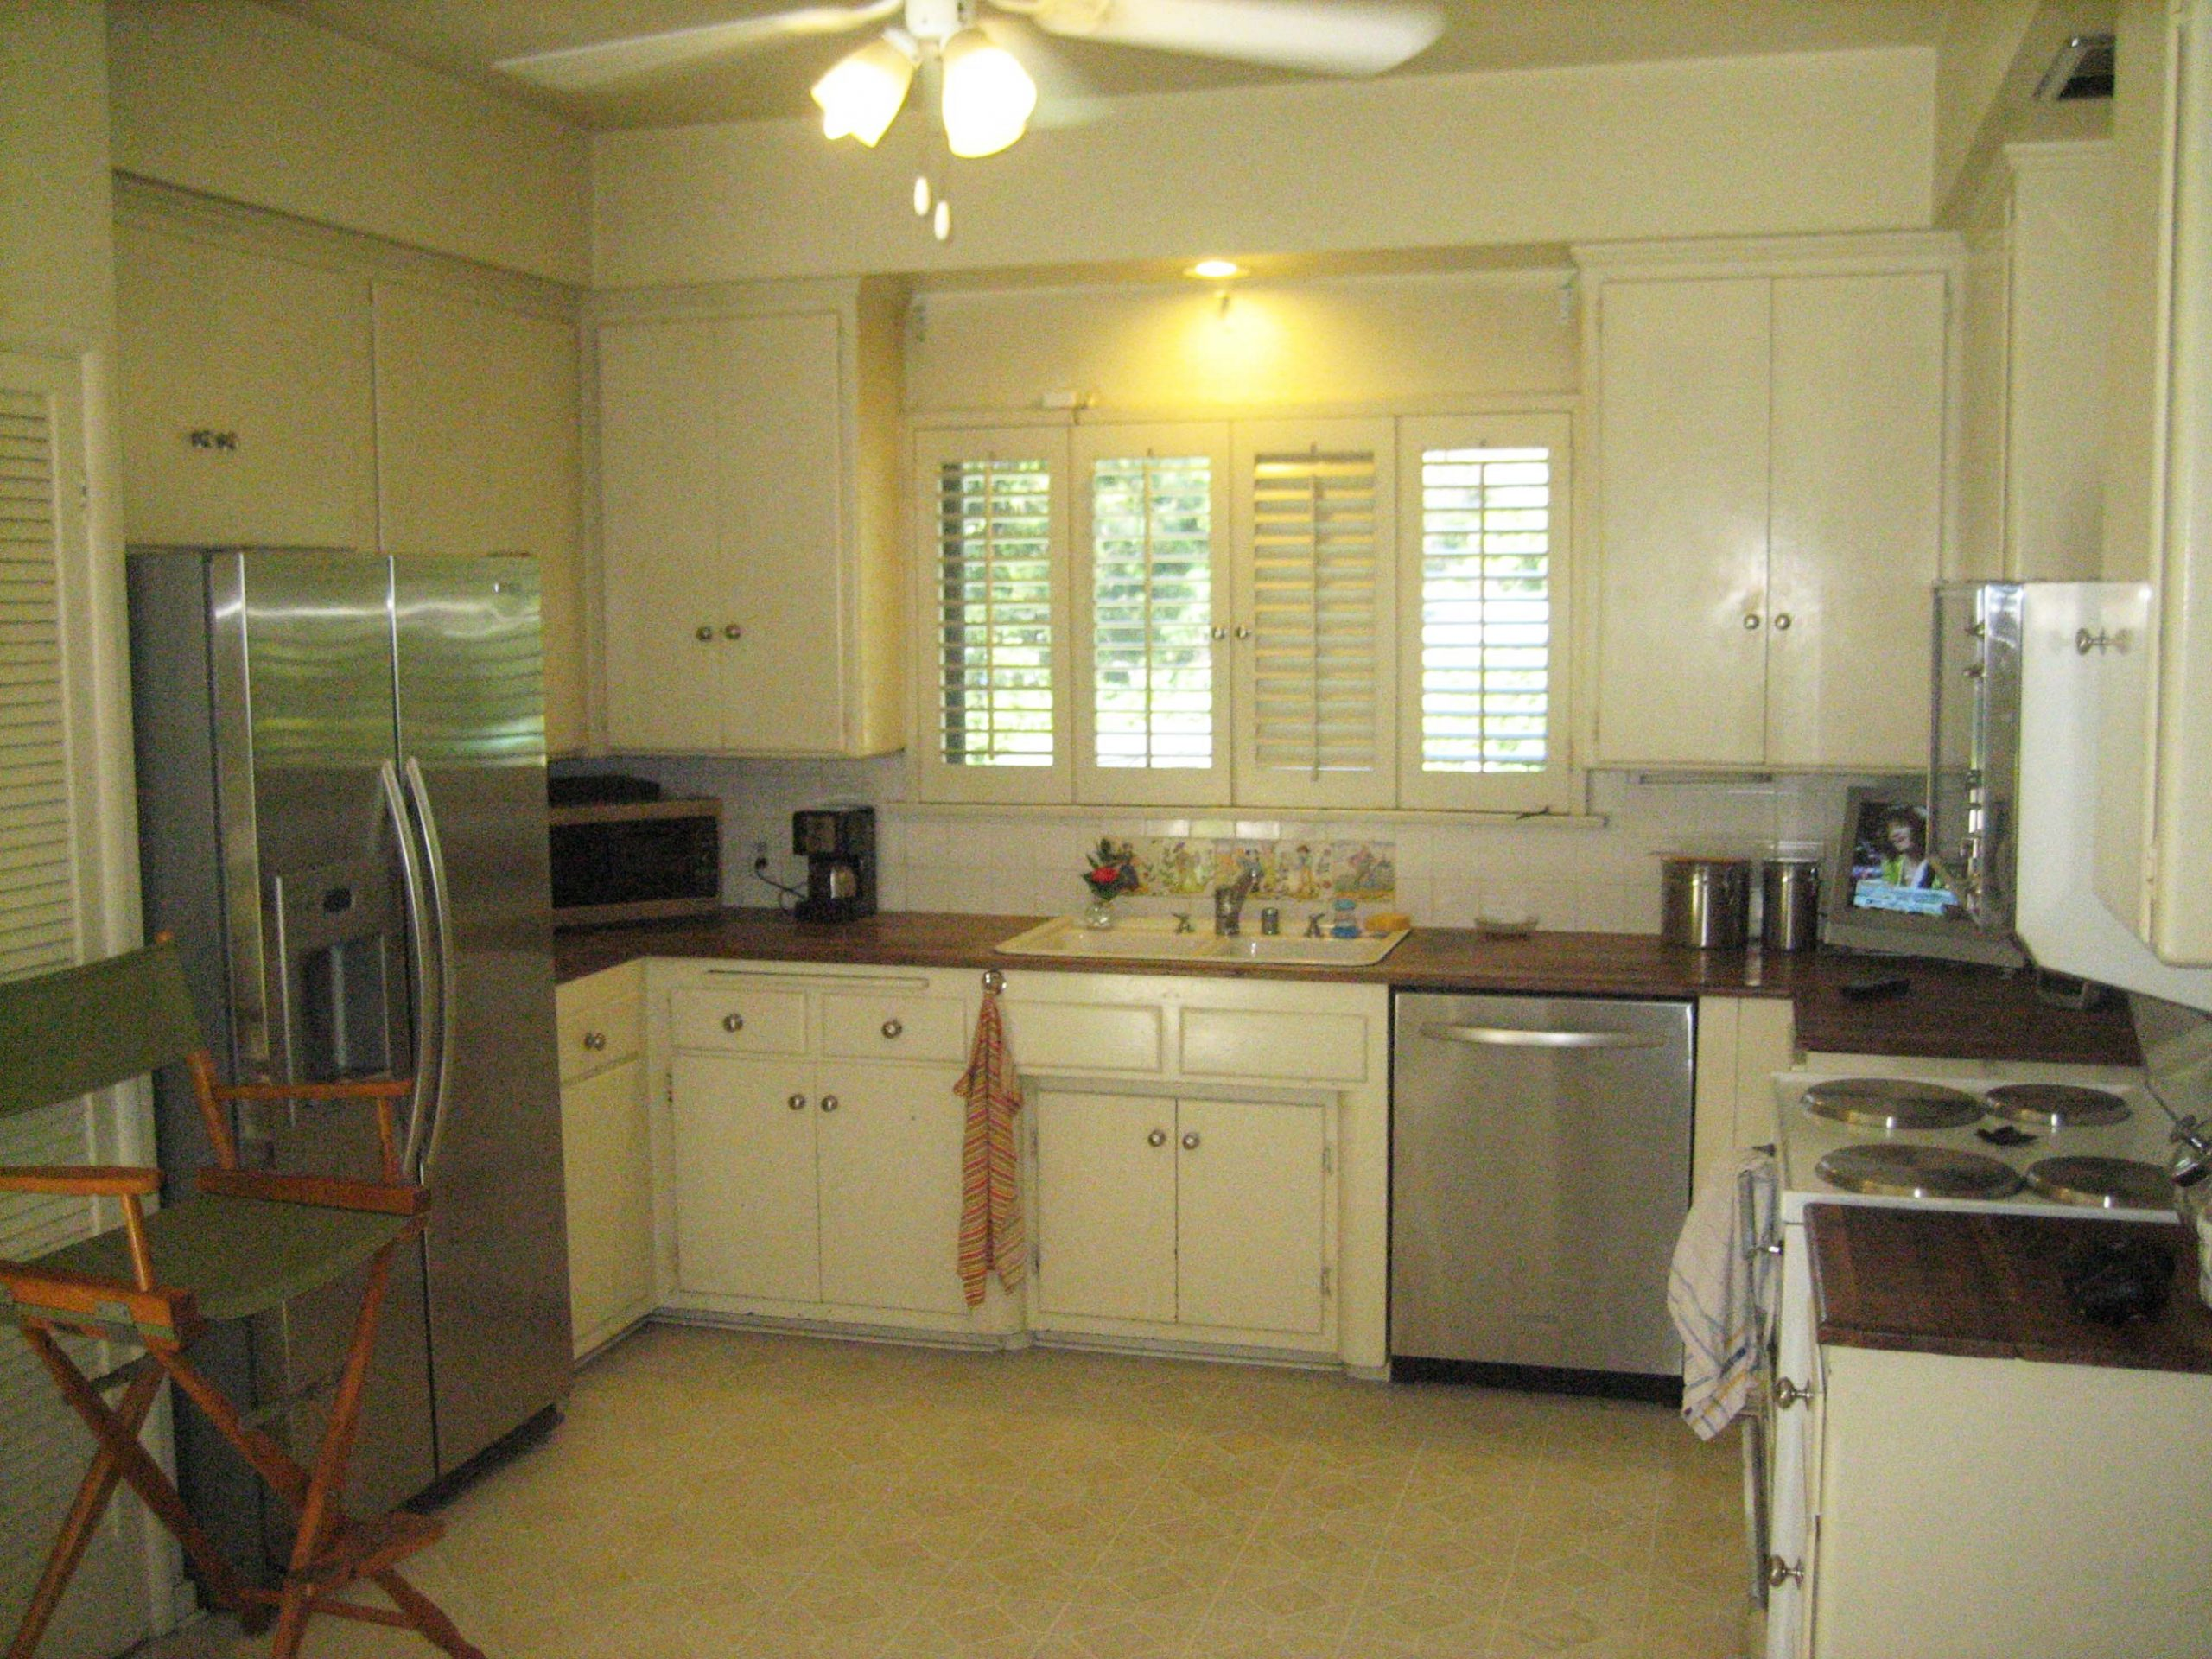 Pasadena Kitchen Remodel - Before